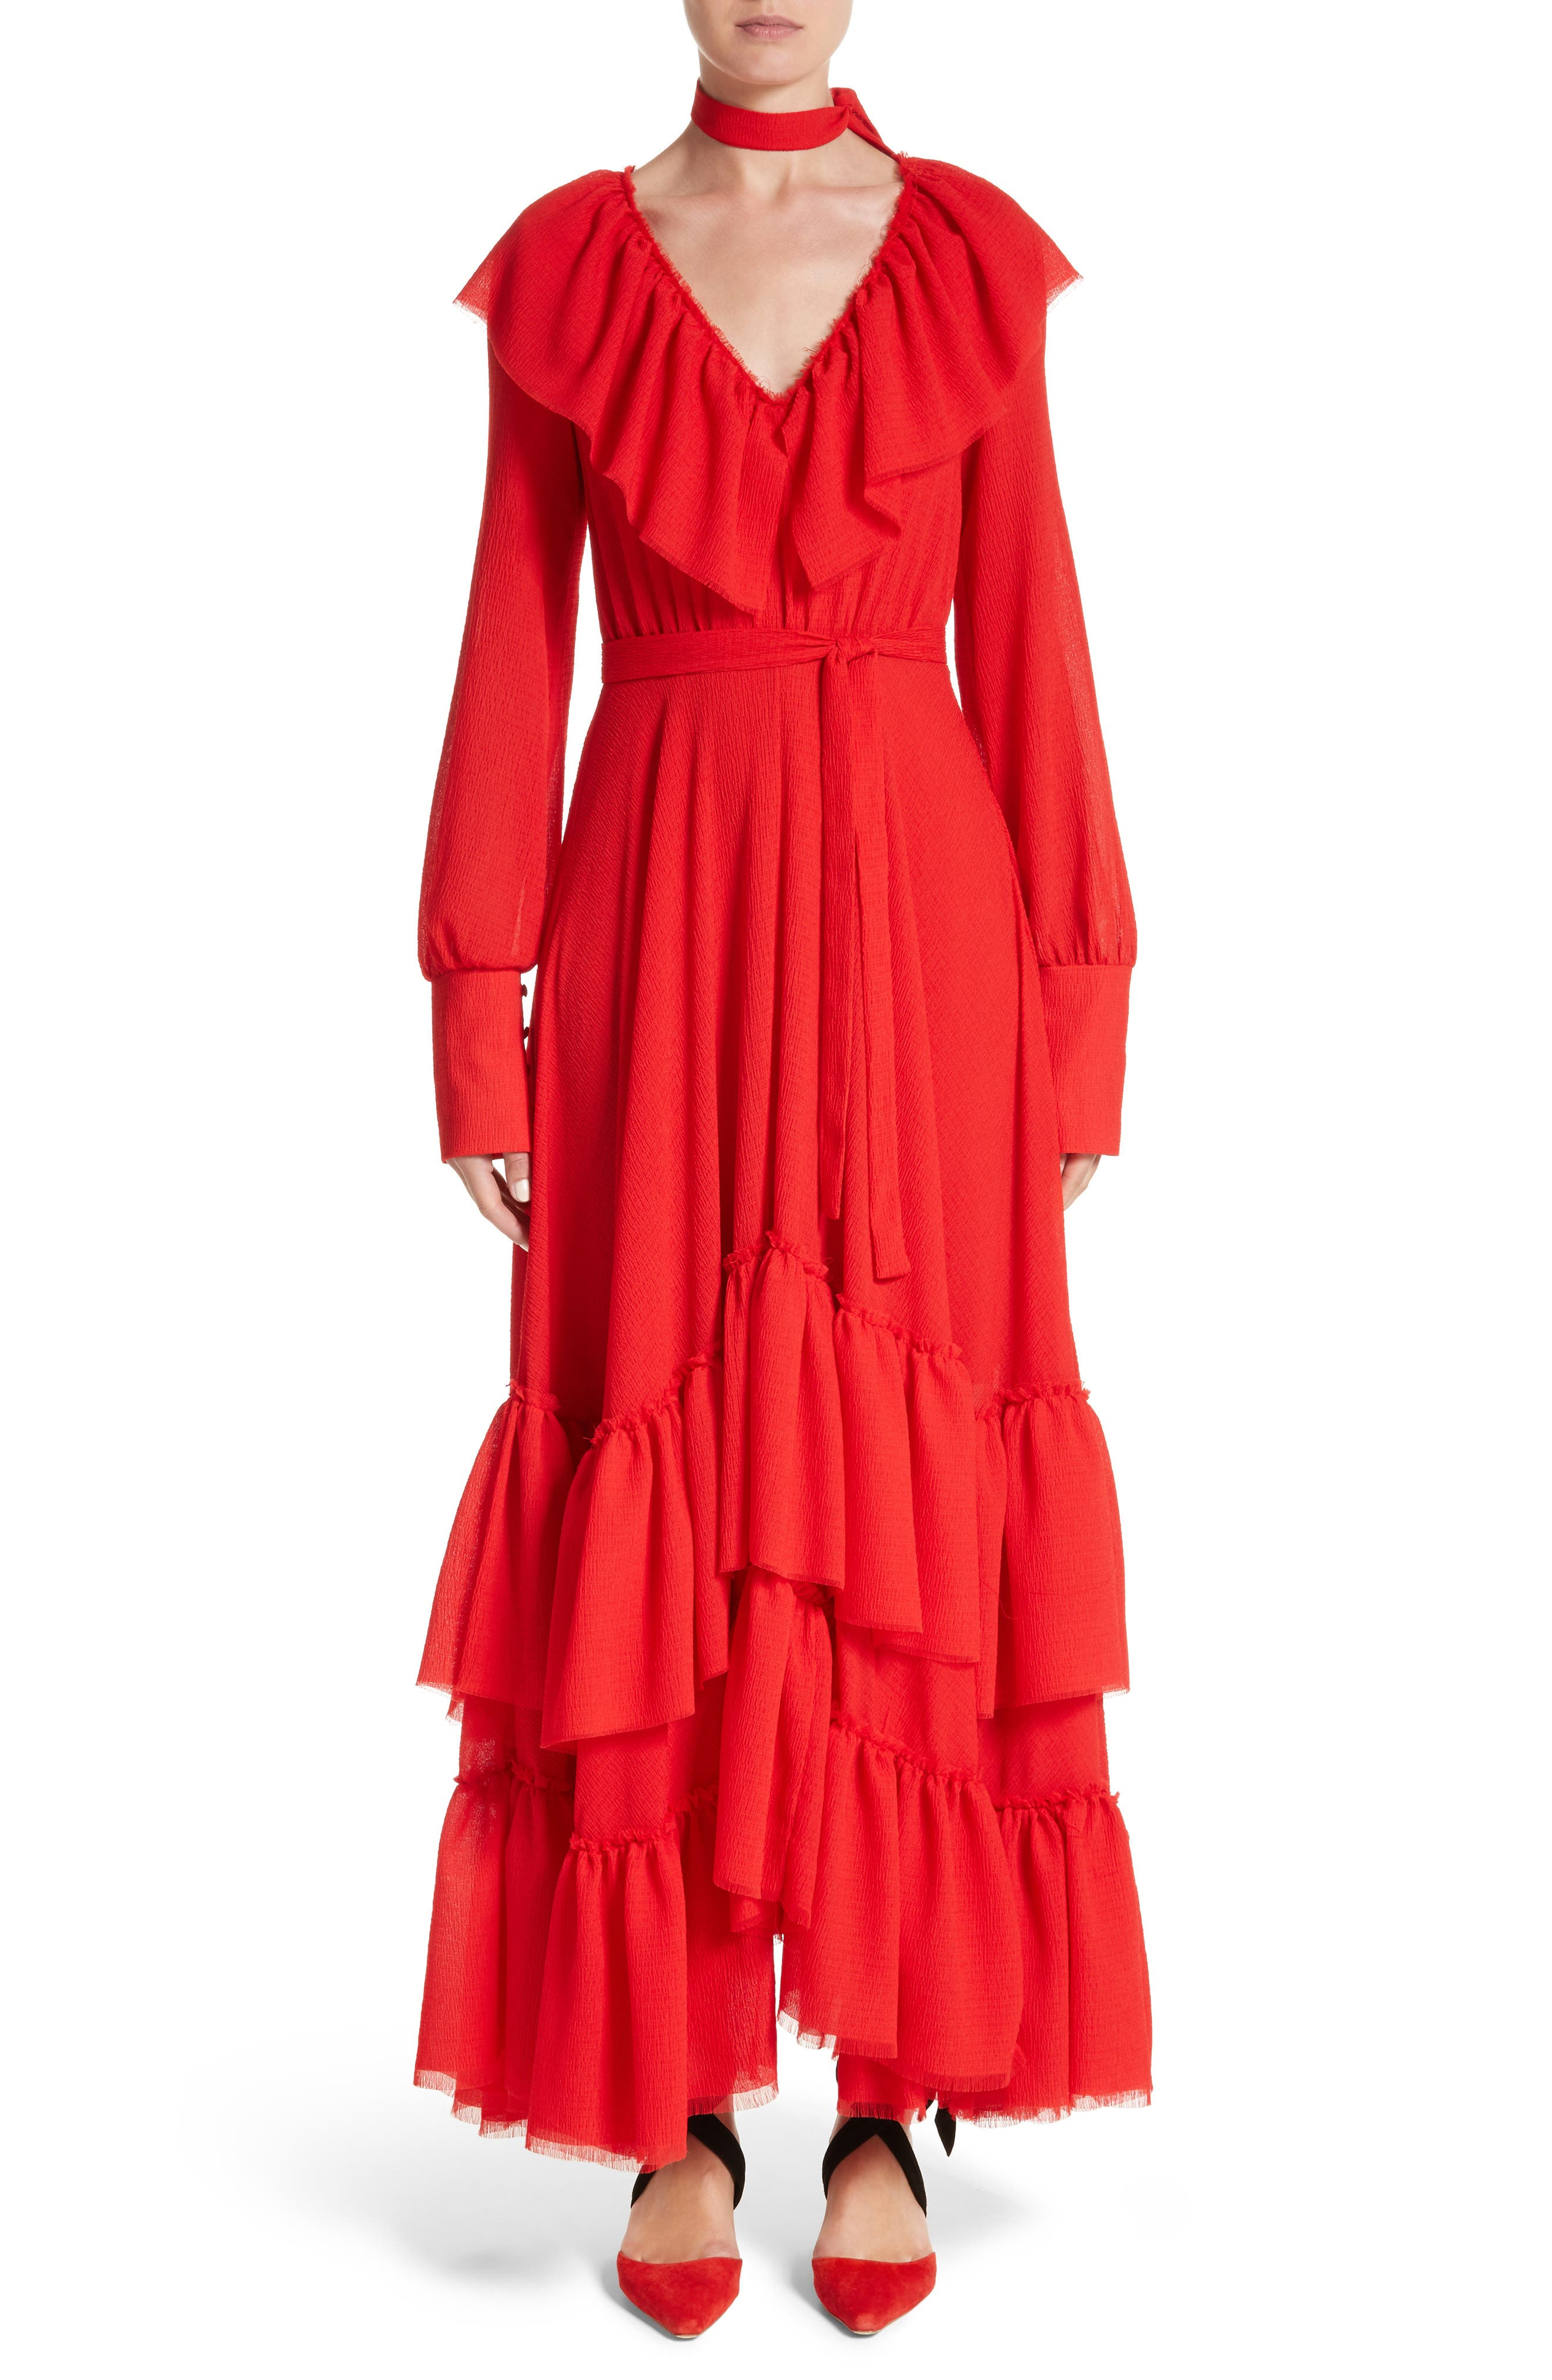 Tiered Ruffle Crepe Maxi Dress,                         Main,                         color, Crepe Seersucker Red